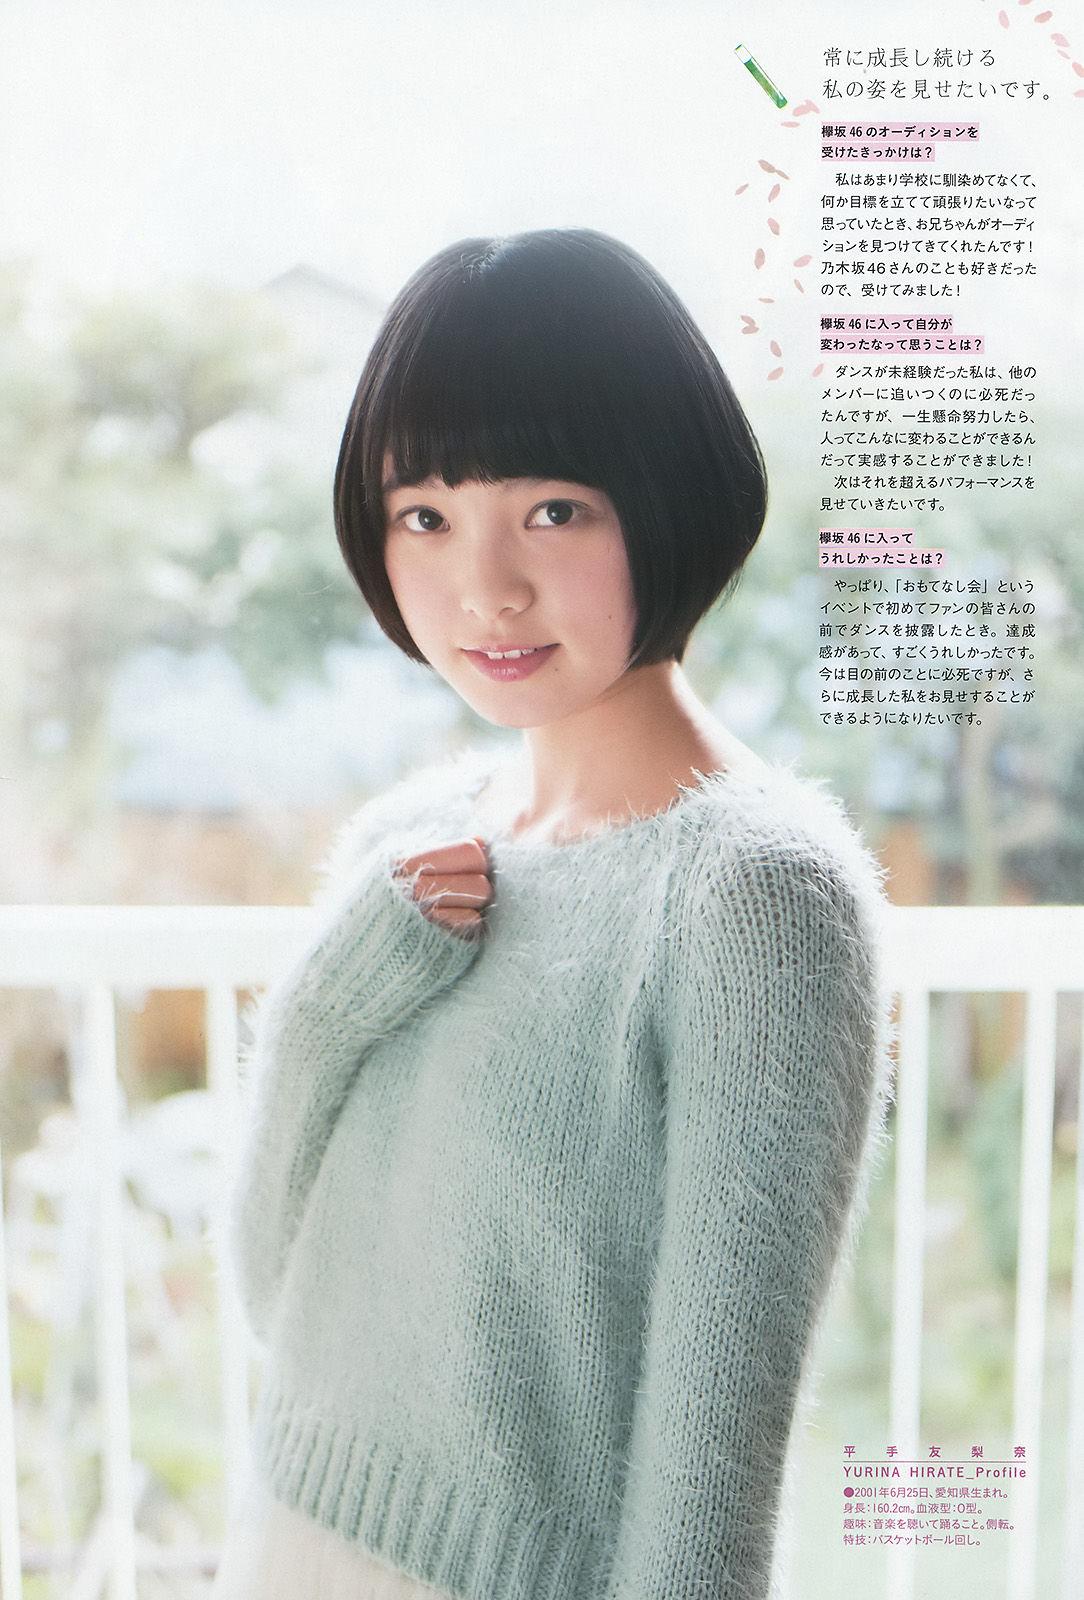 [Weekly Big Comic Spirits杂志写真]榉坂46(欅坂46,Keyakizaka46)超高清写真大图片(8P) 805热度